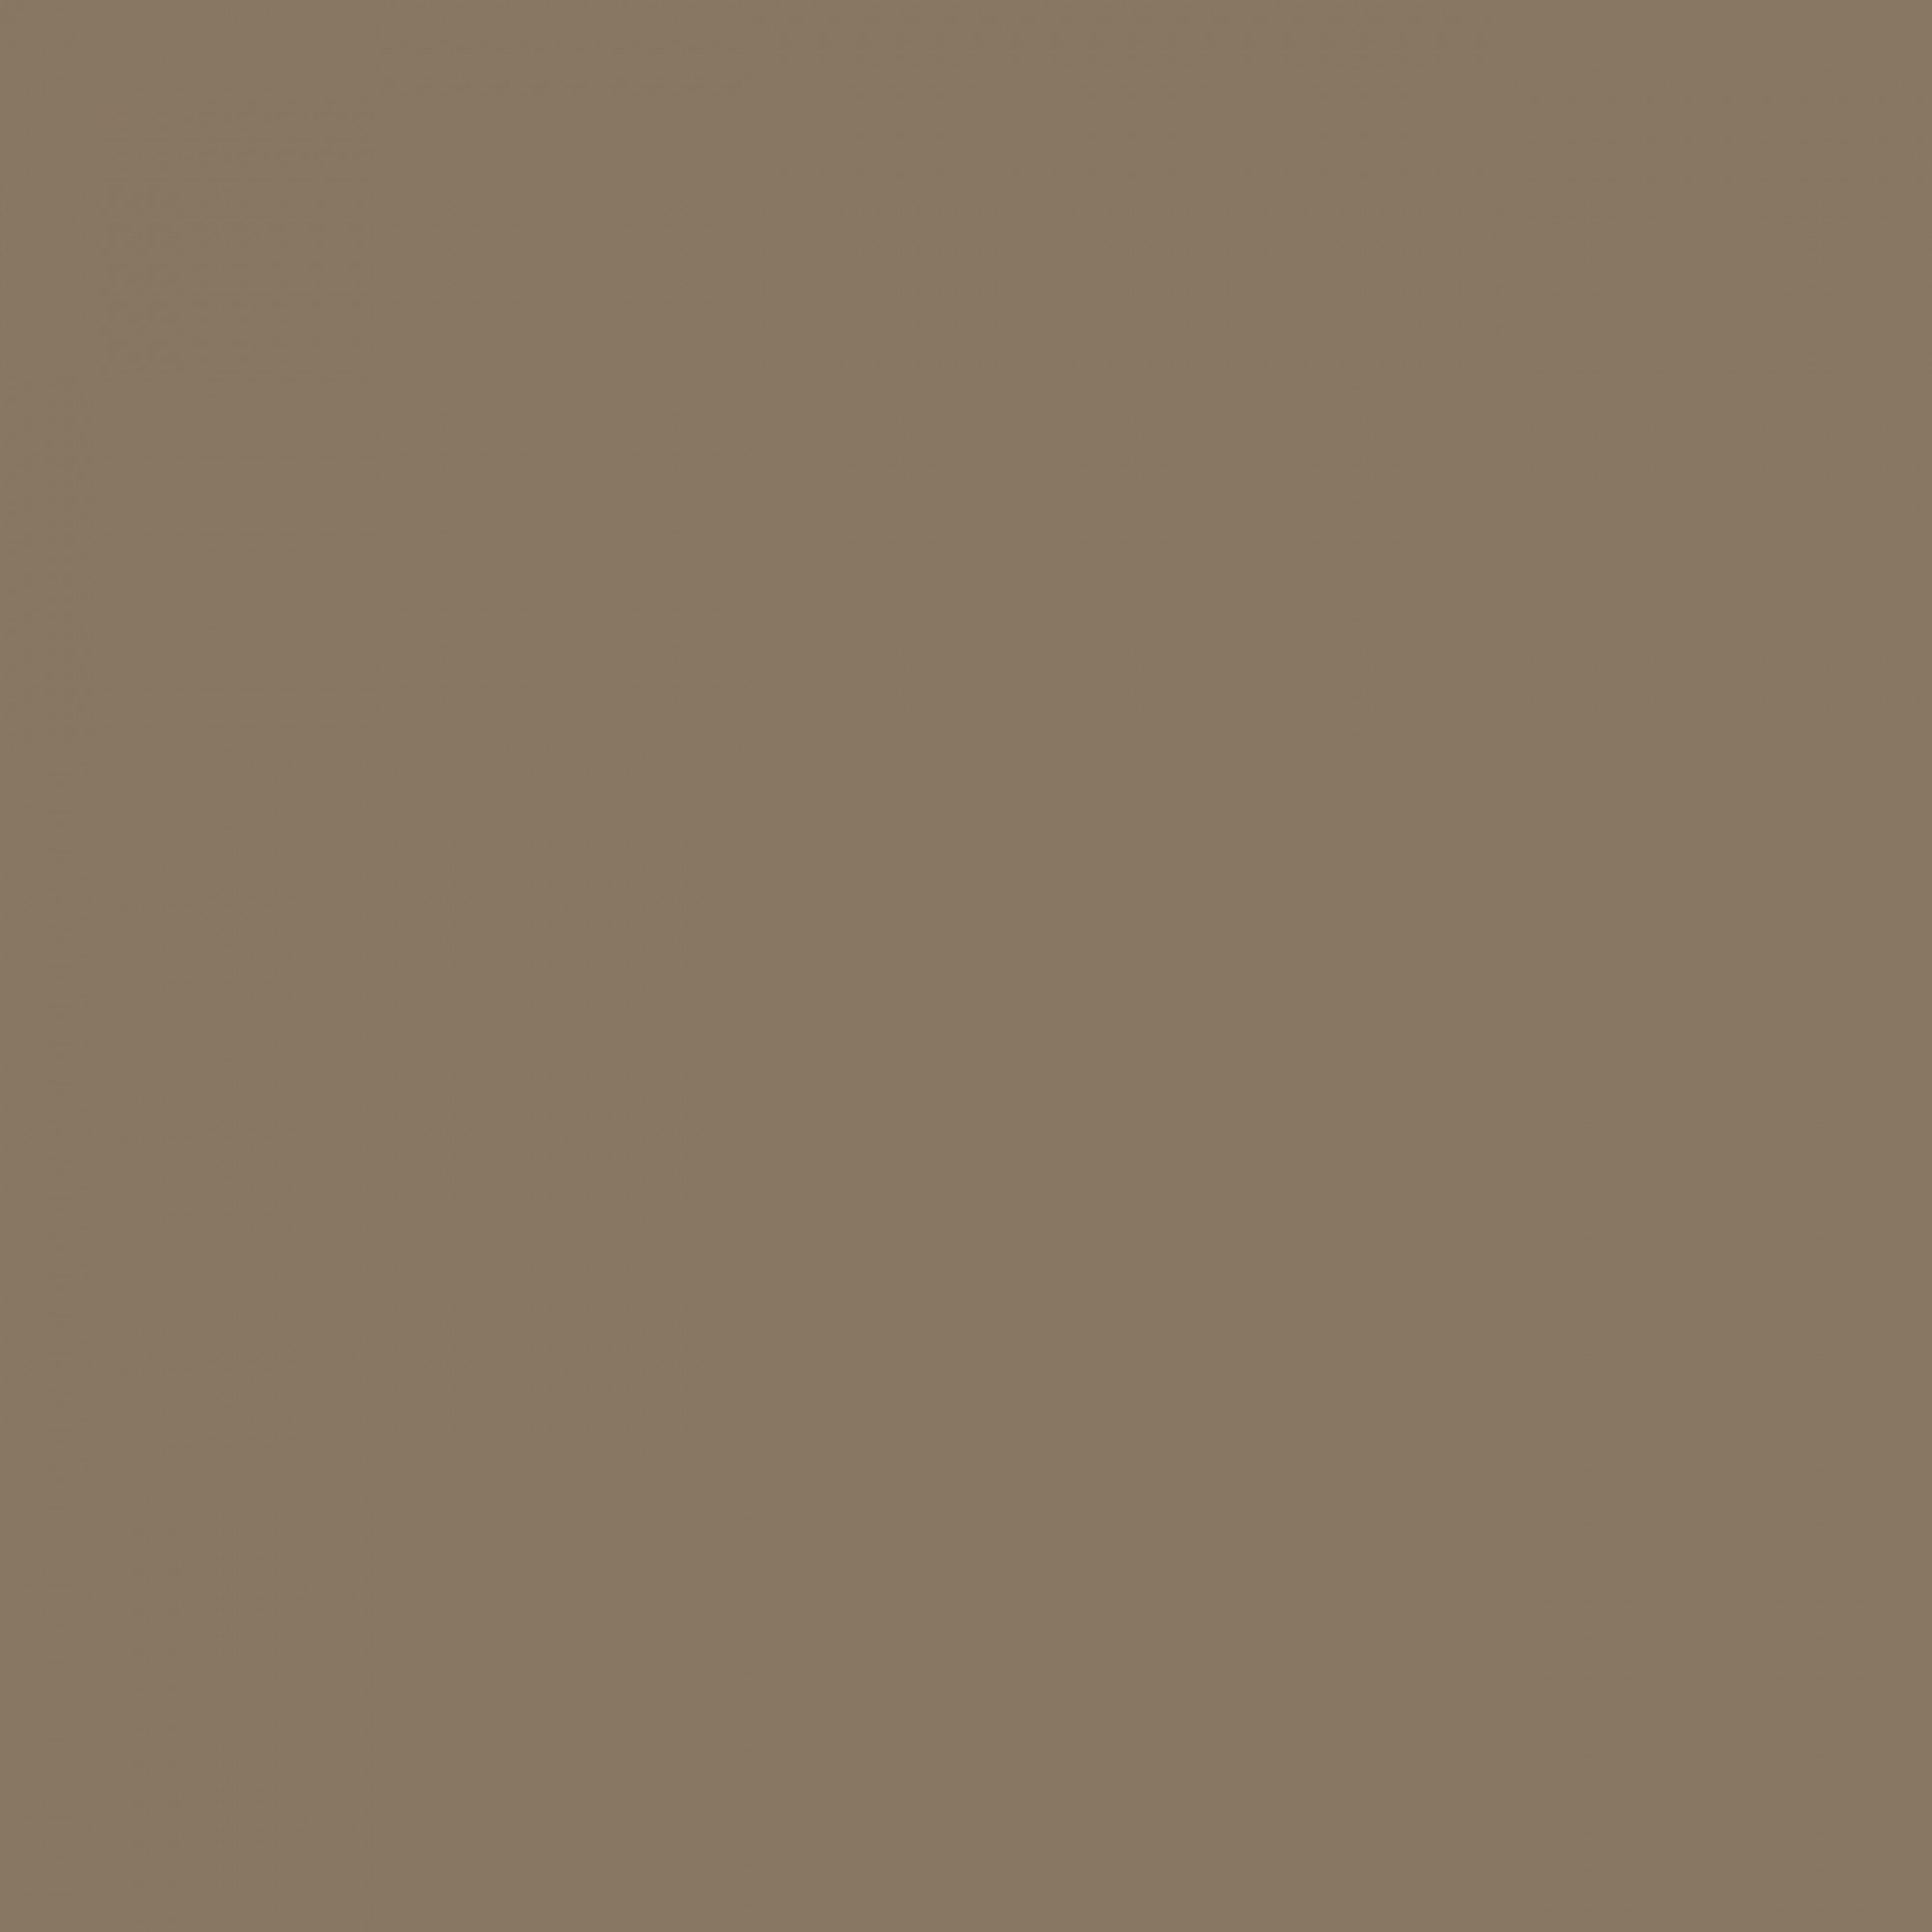 Pigment - allatidersskebo